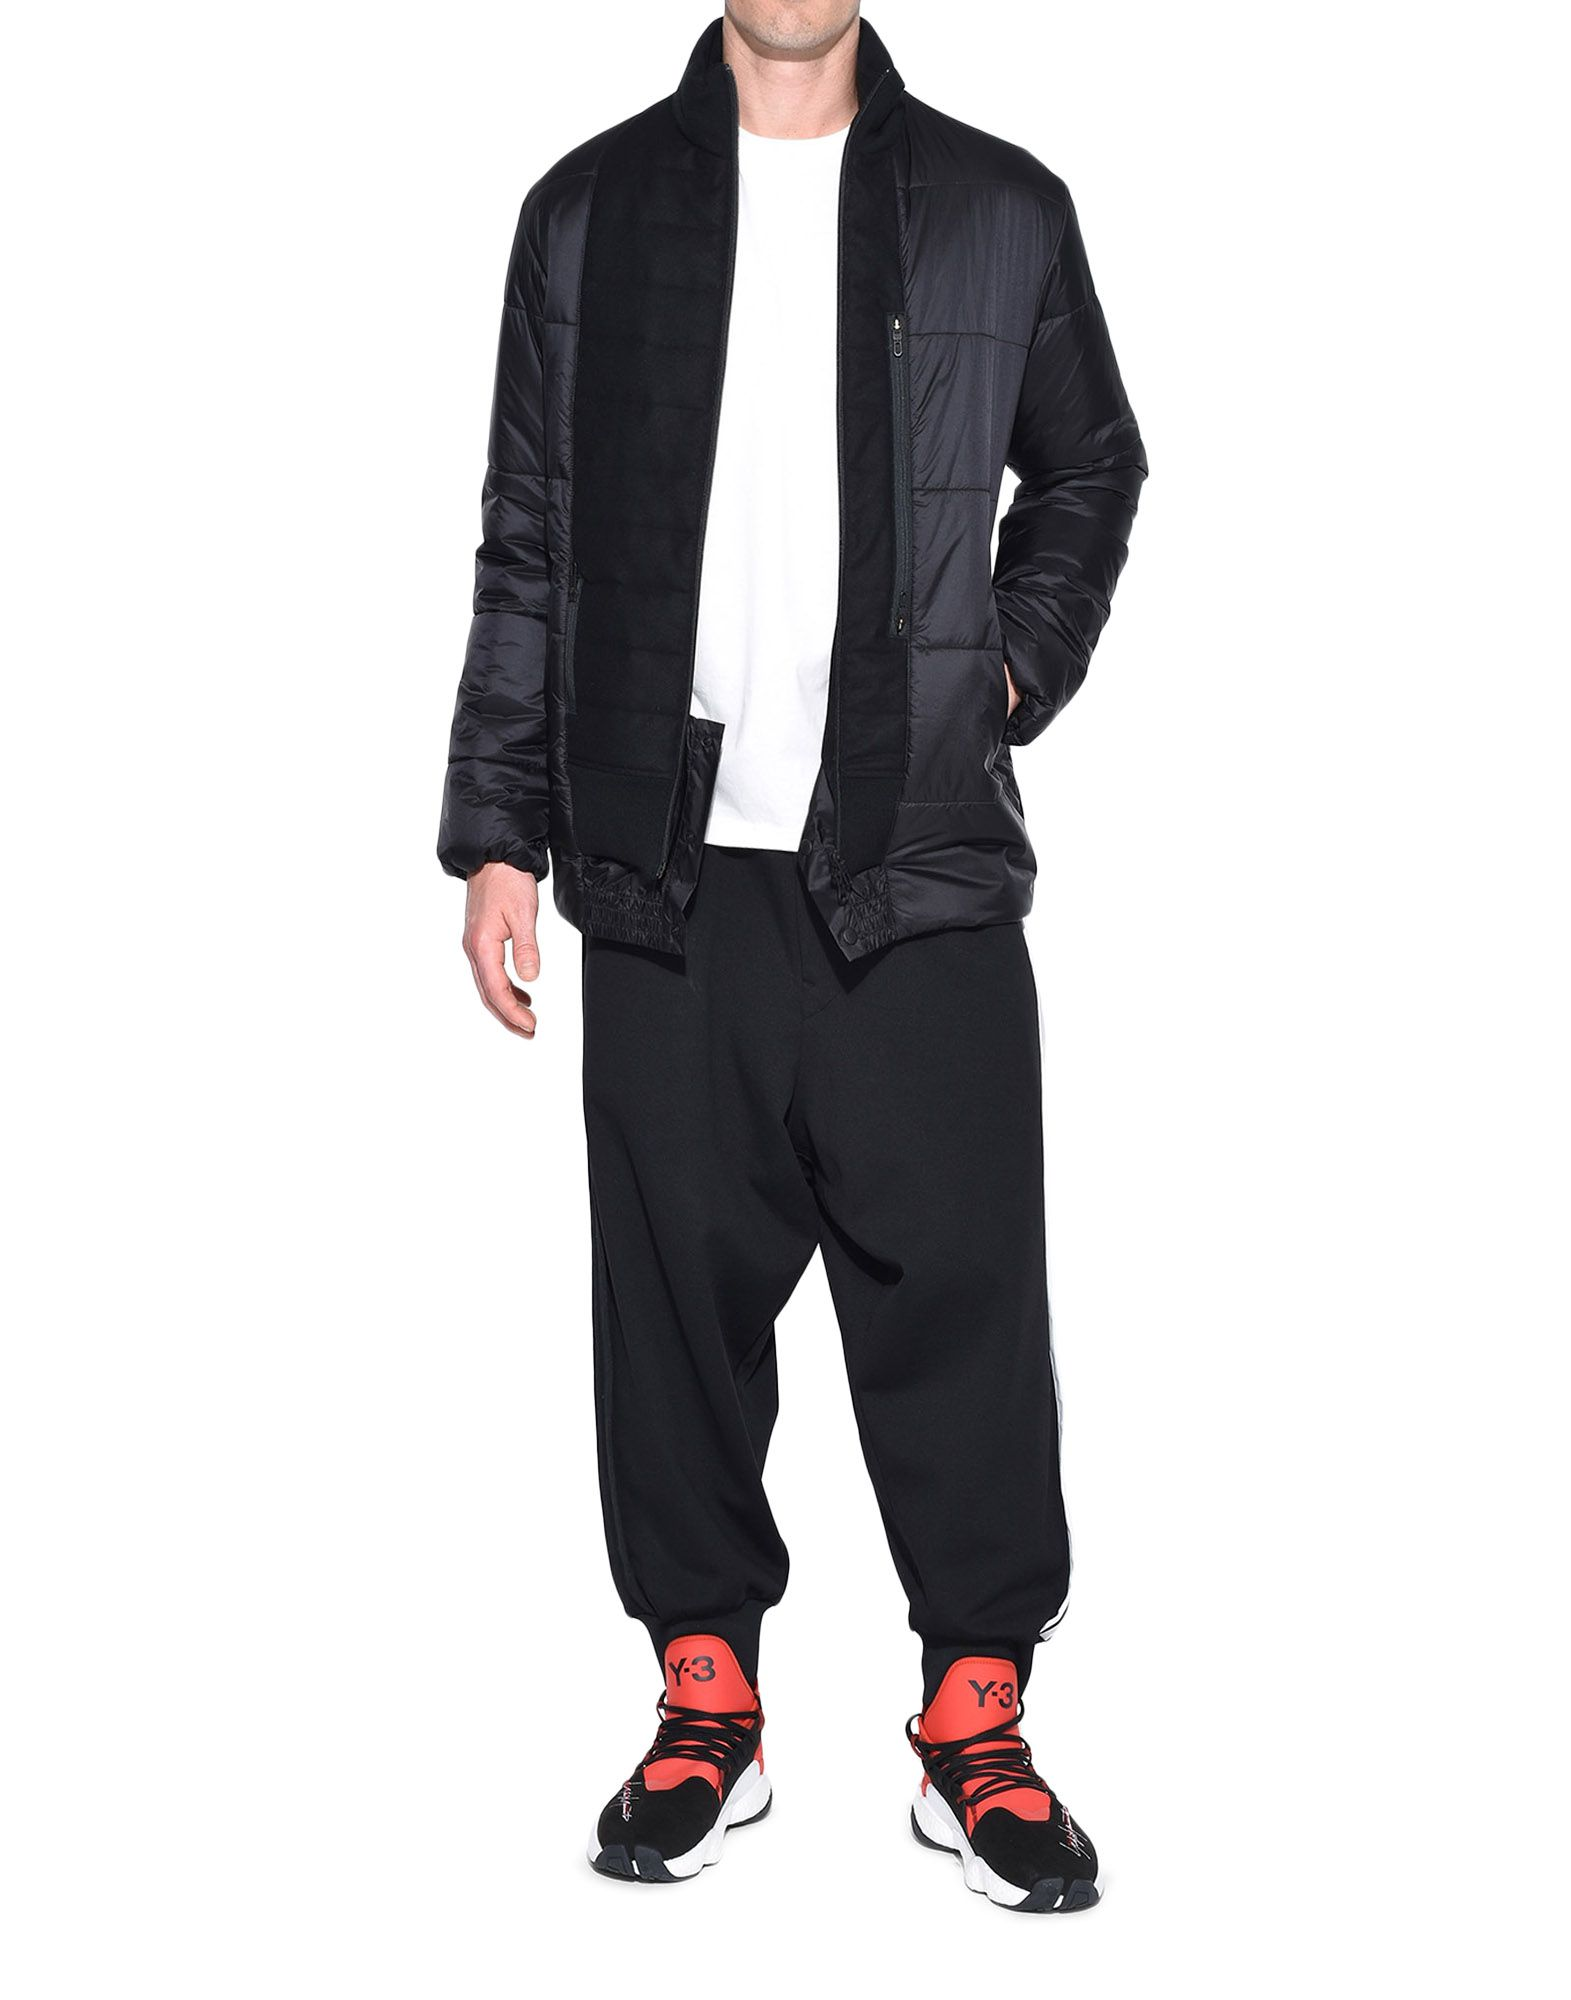 Y-3 Y-3 Patchwork Down Jacket Down jacket Man a